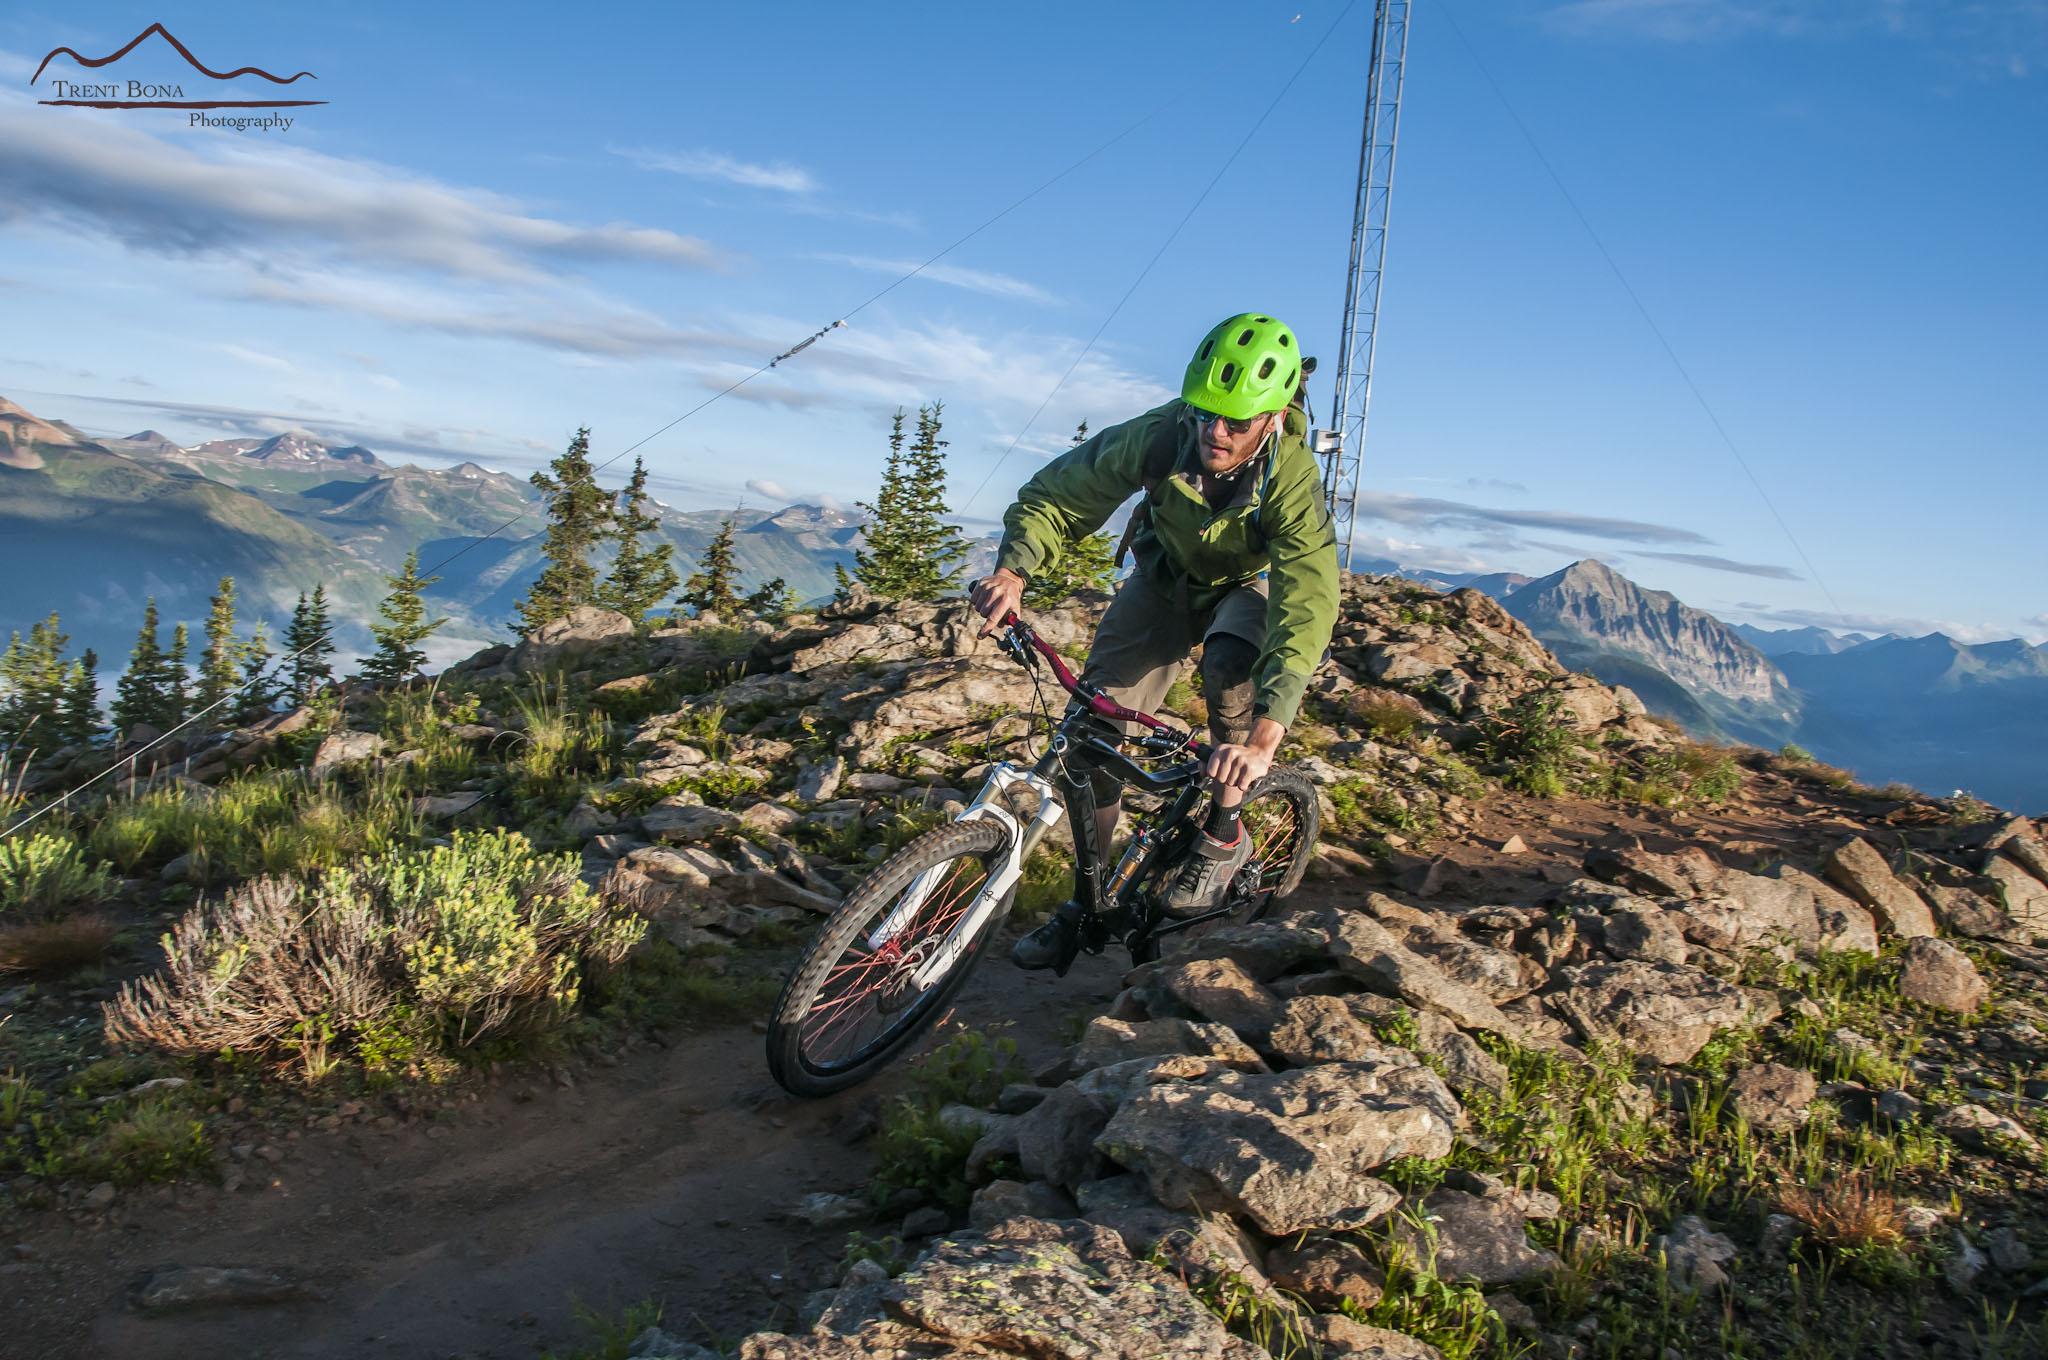 Rider: Ryan Harter